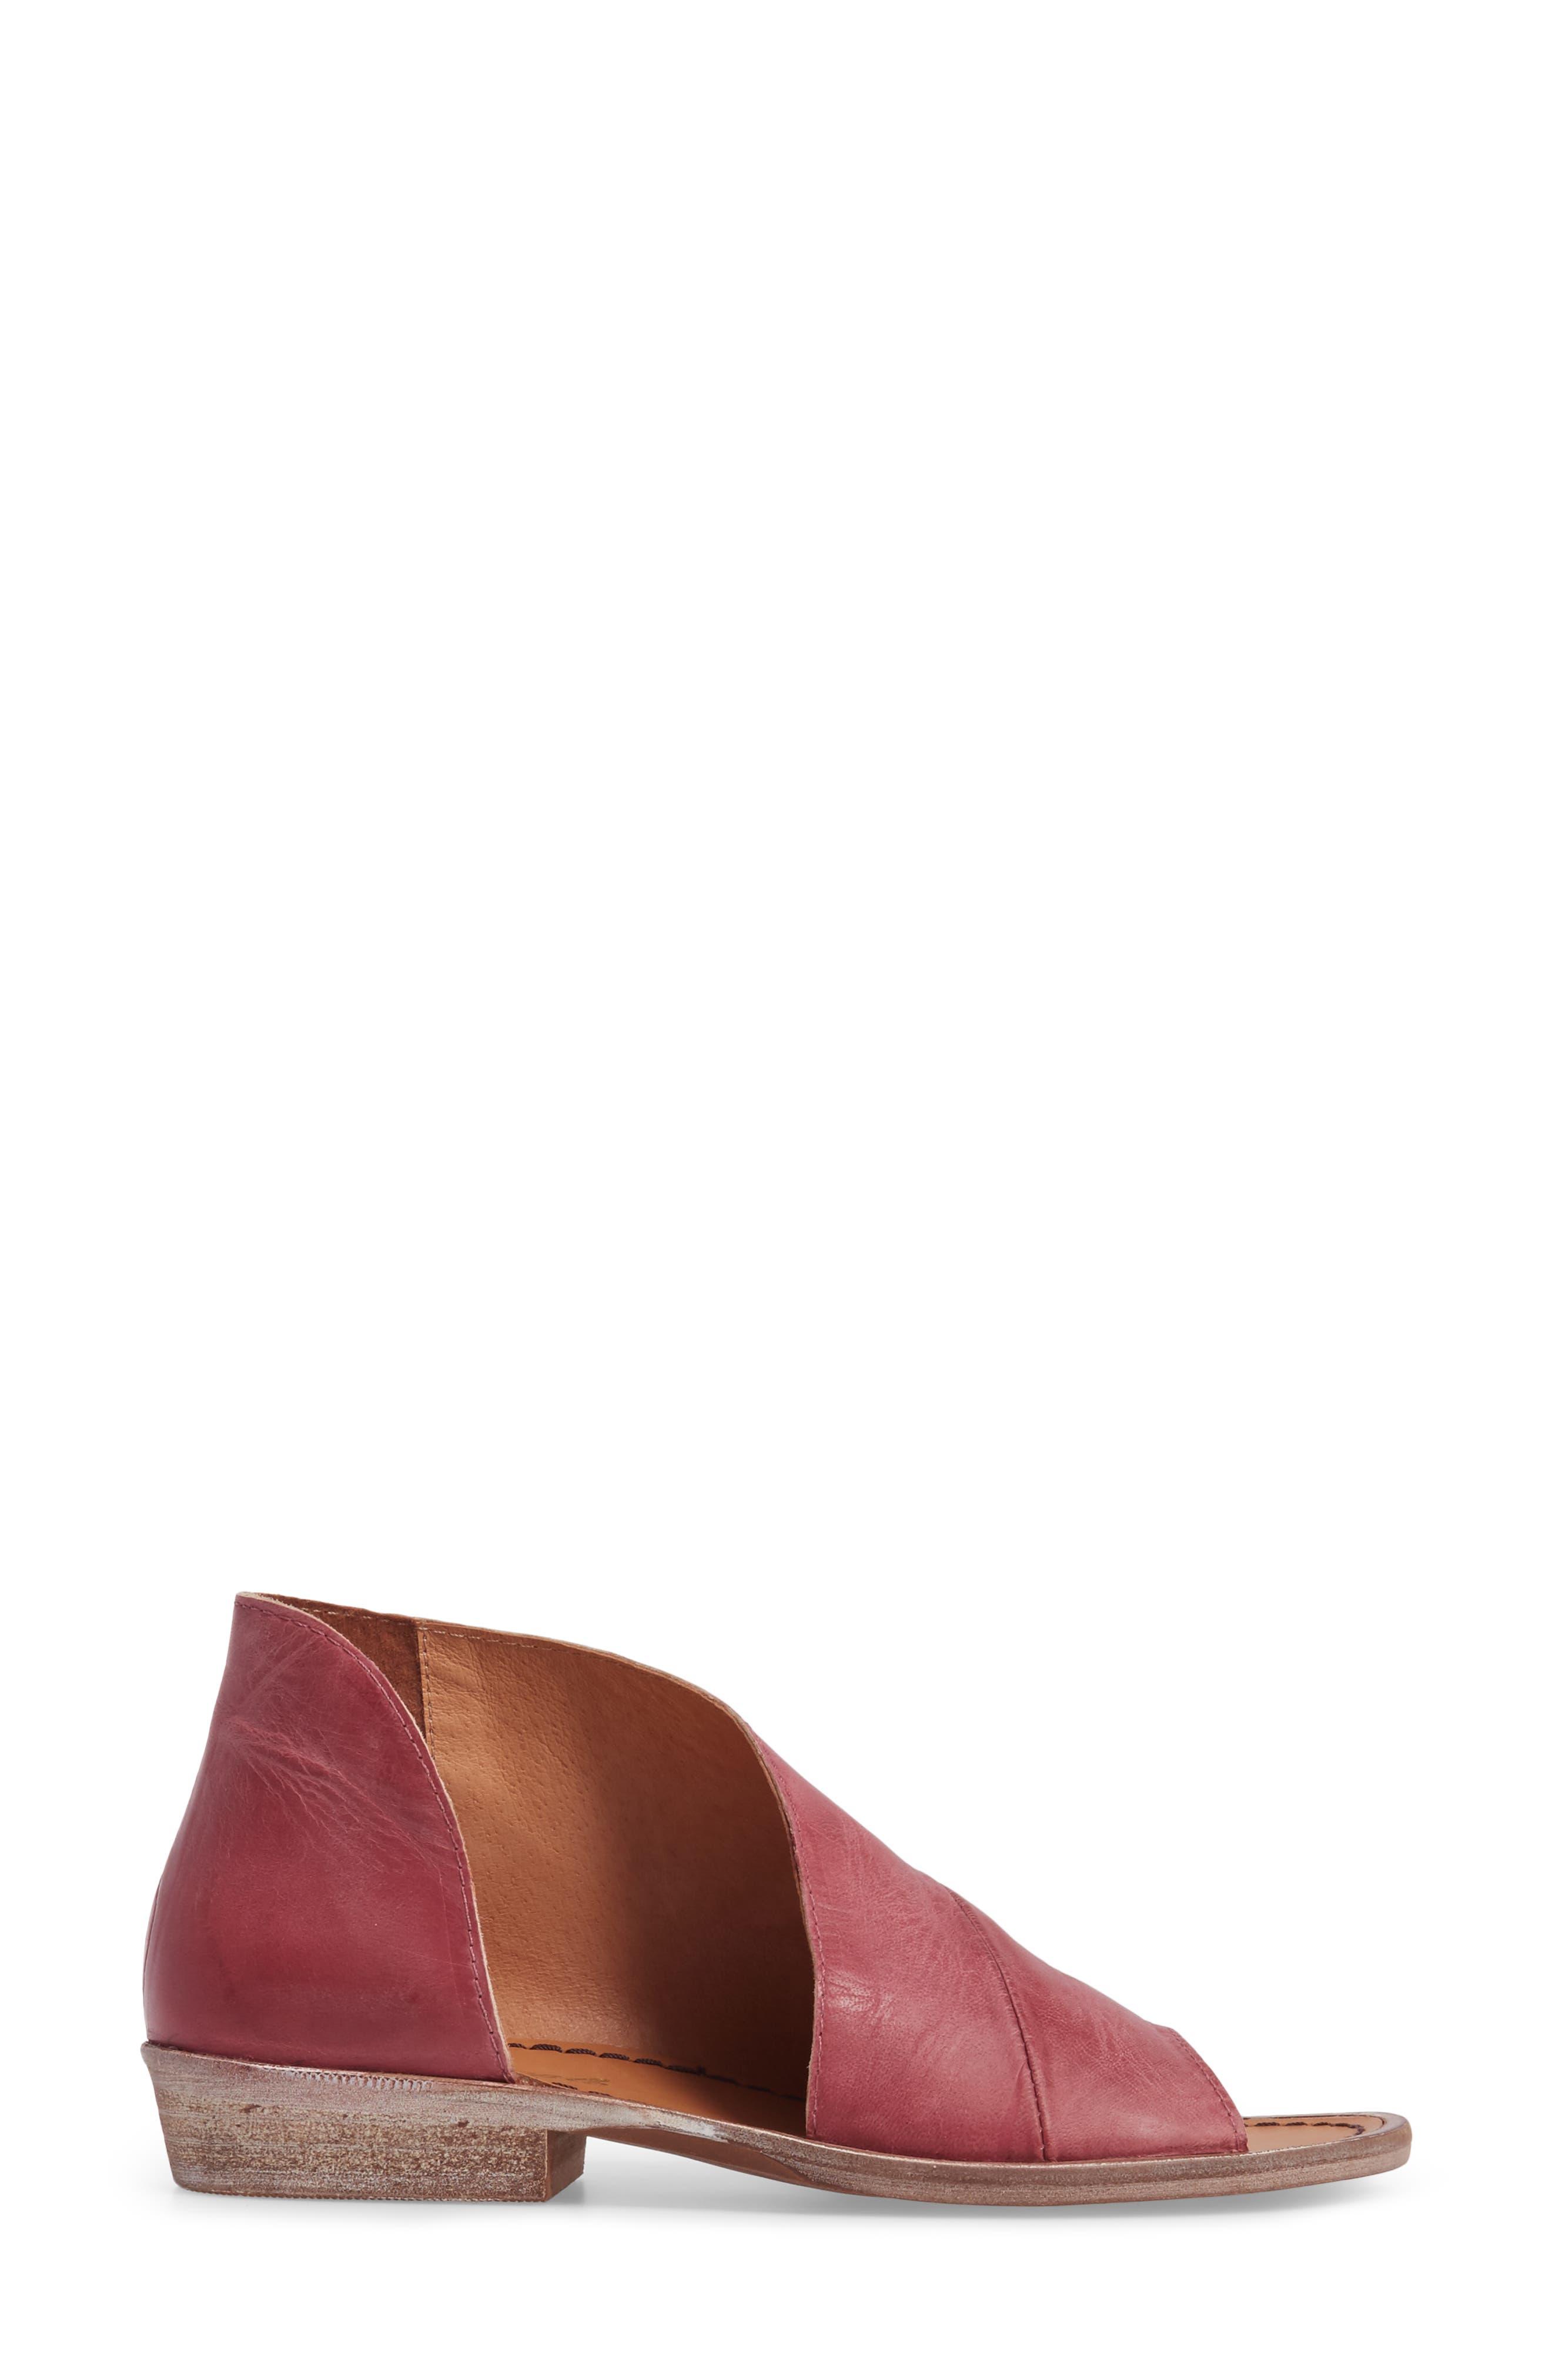 'Mont Blanc' Asymmetrical Sandal,                             Alternate thumbnail 42, color,